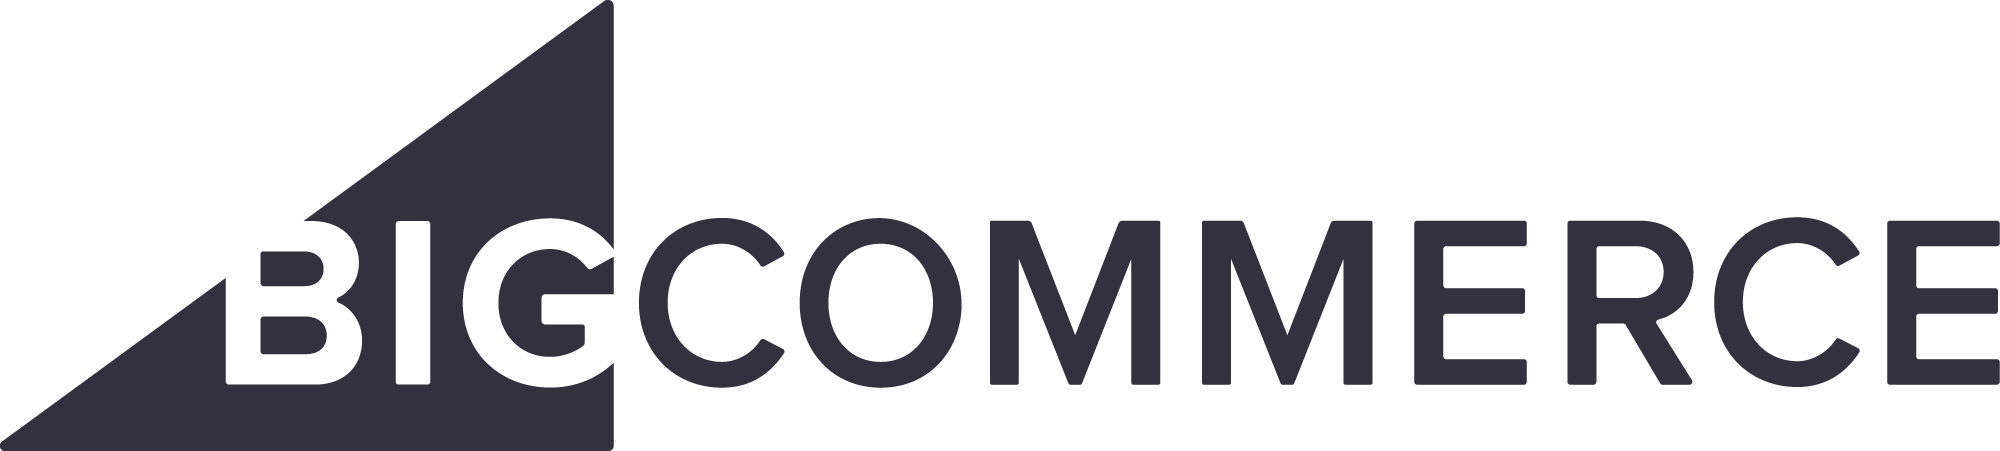 BigCommerce-logo-dark-1